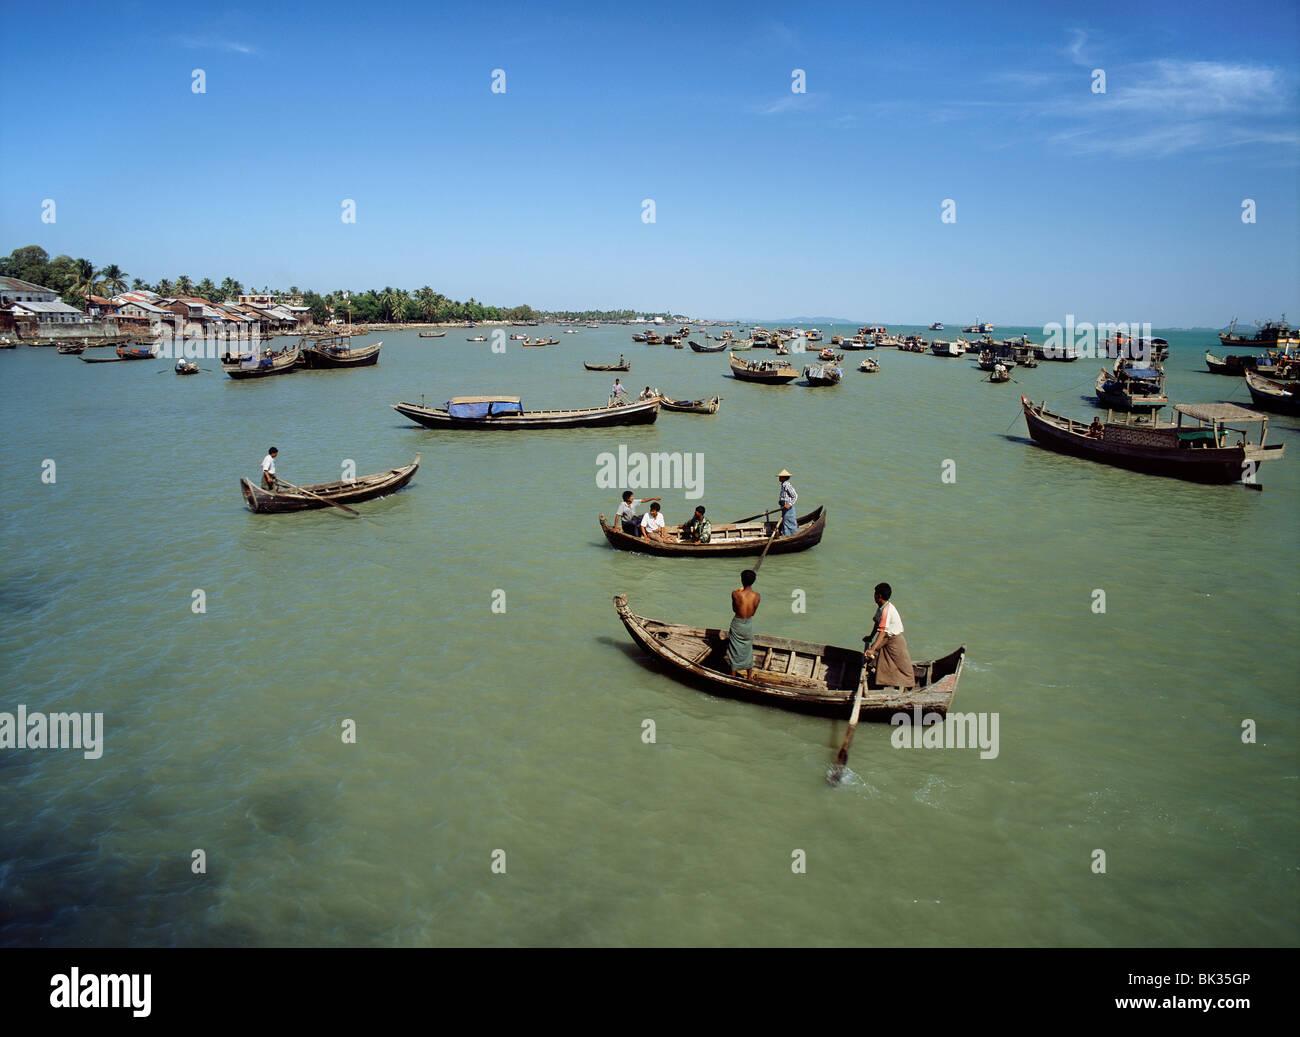 The harbour at the mouth of Kaladan River, Sittwe, capital of Arakan State, Myanmar (Burma), Asia - Stock Image